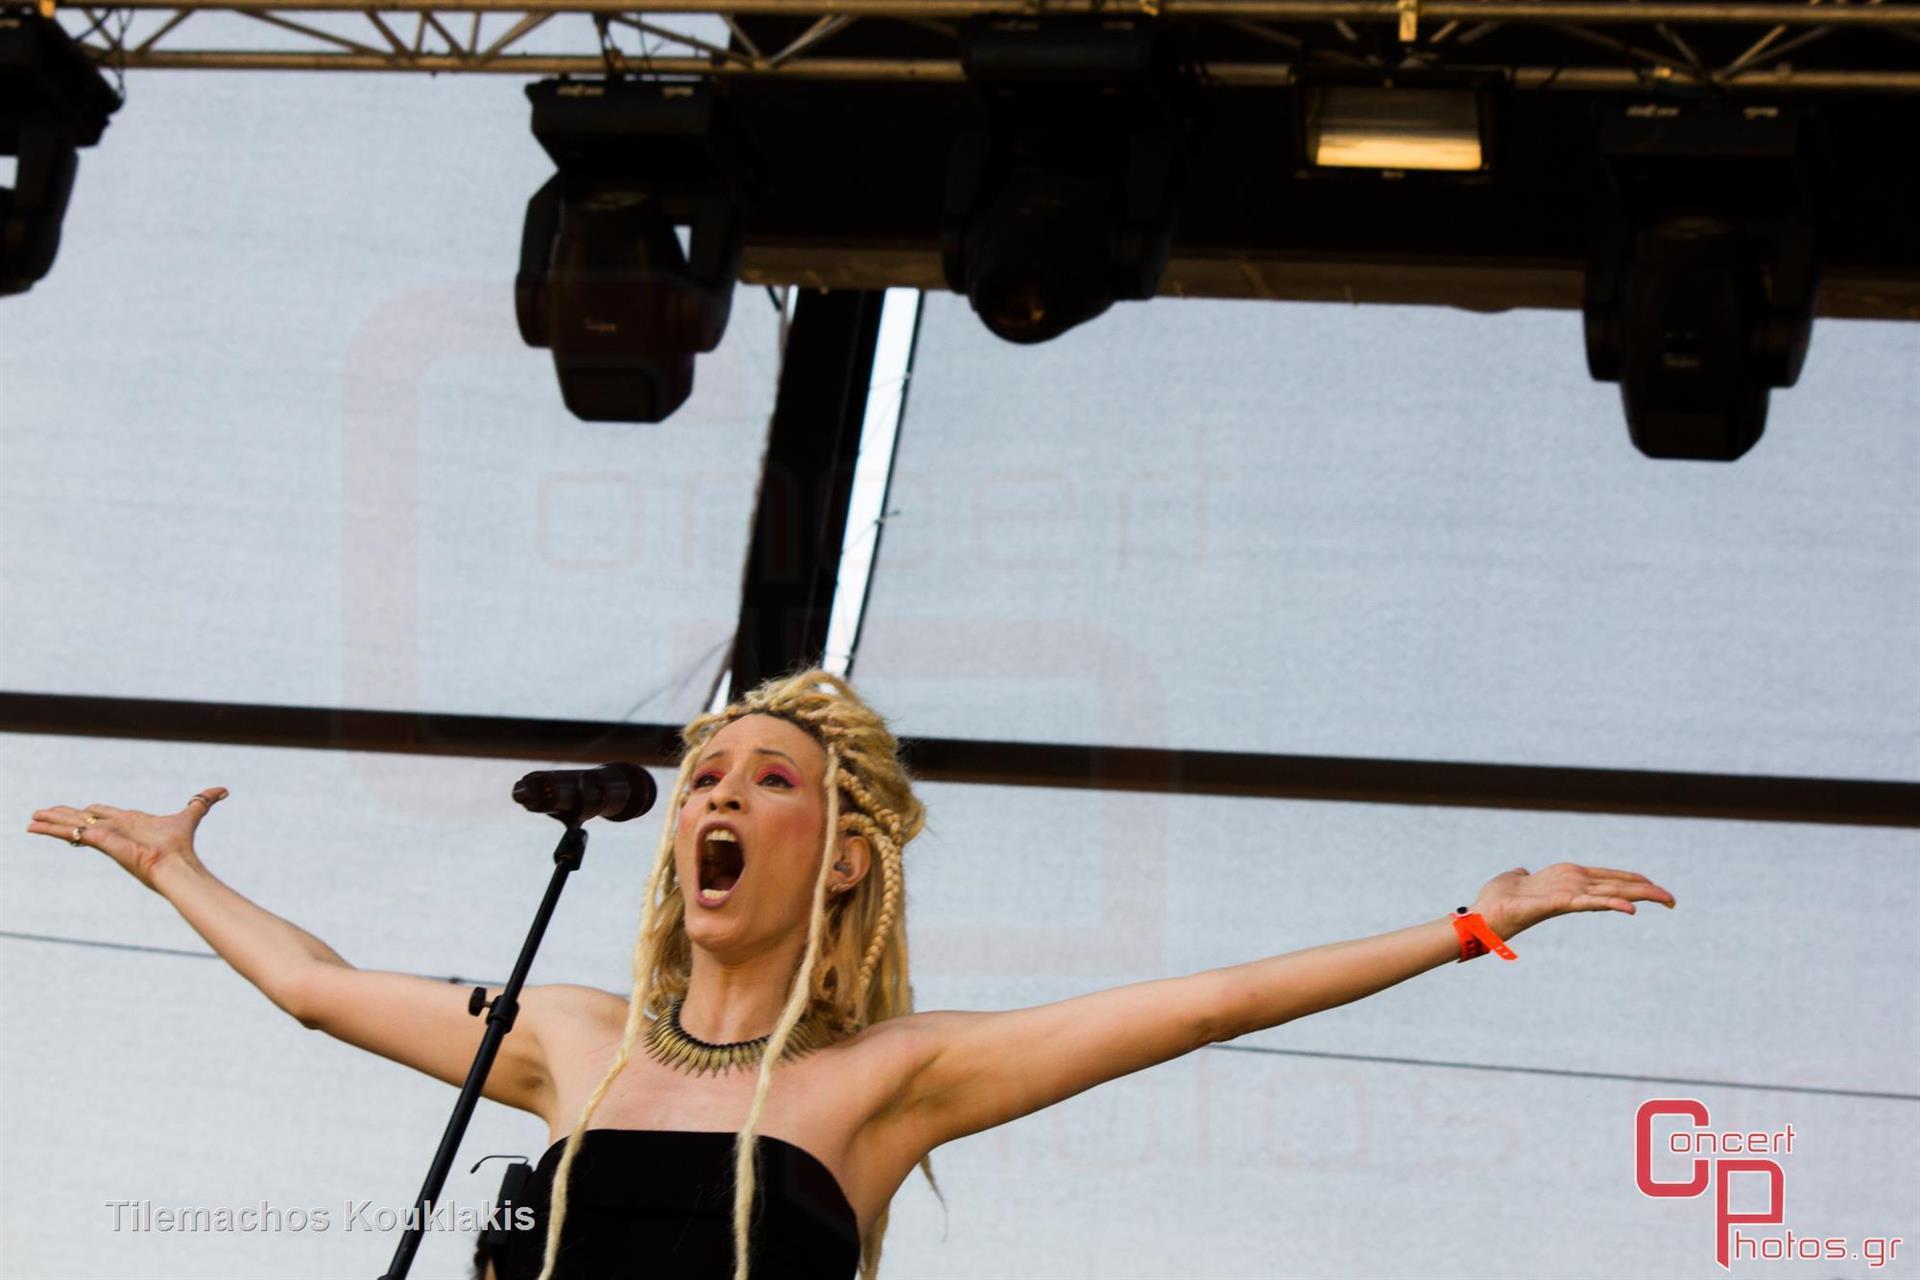 Chaostar-Chaostar photographer: Tilemachos Kouklakis - concertphotos_-0259